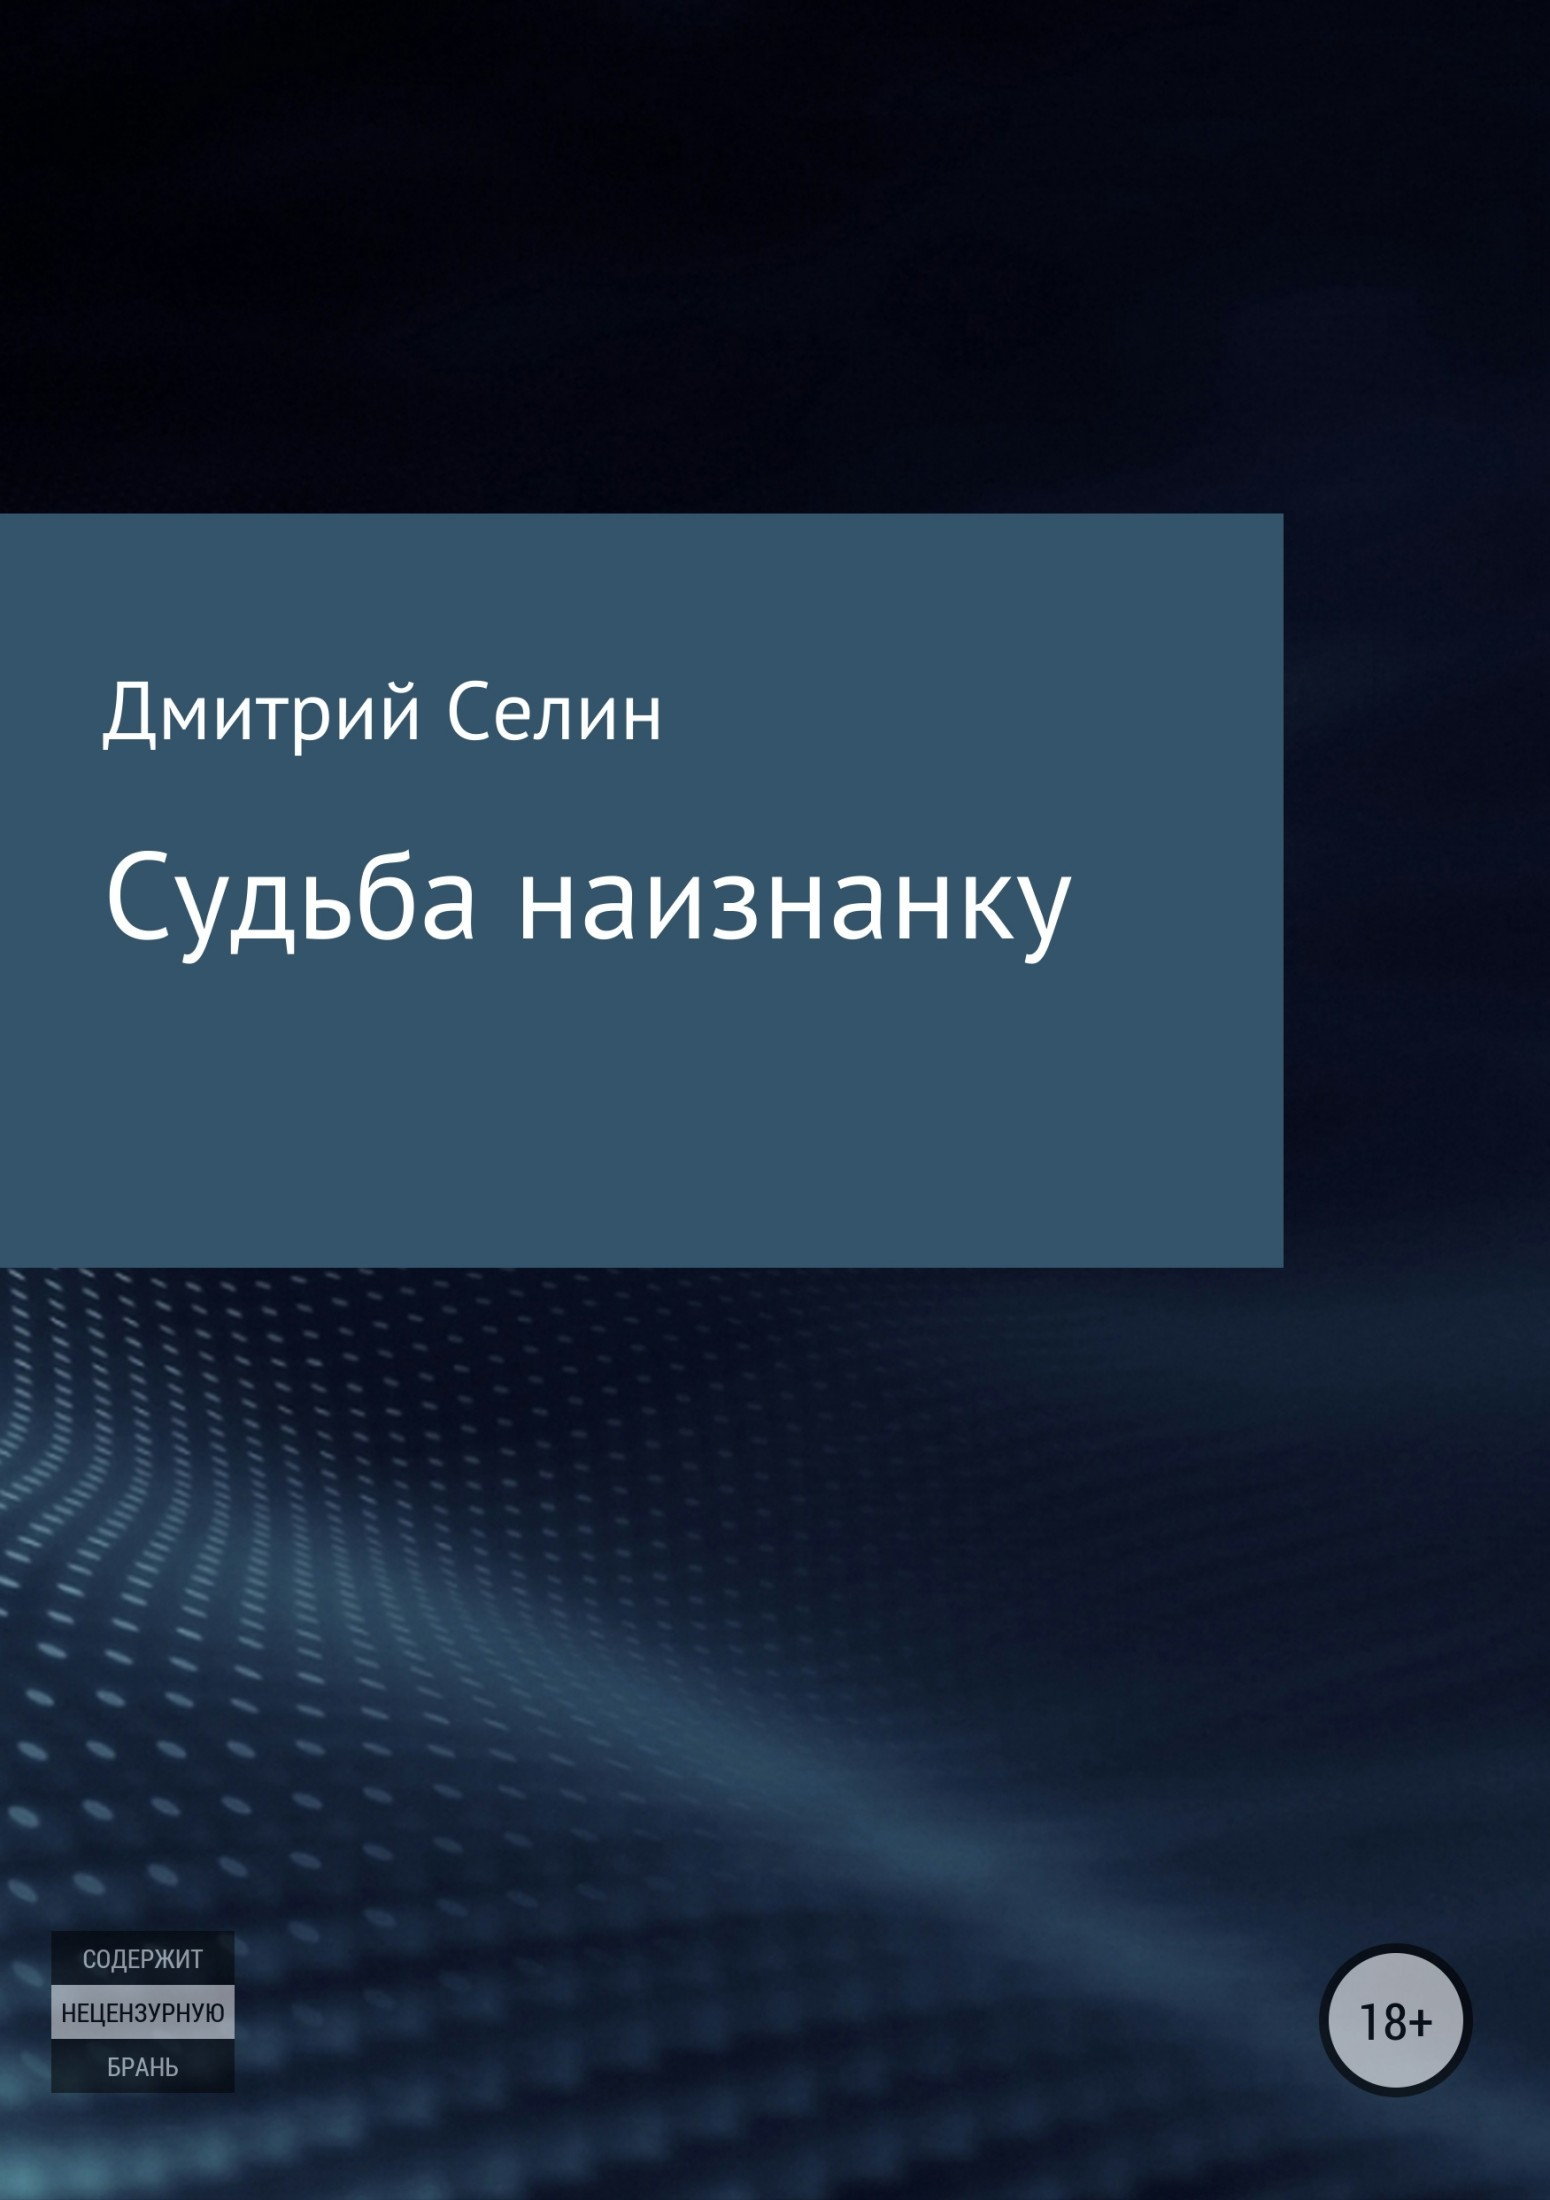 цена на Дмитрий Селин Судьба наизнанку